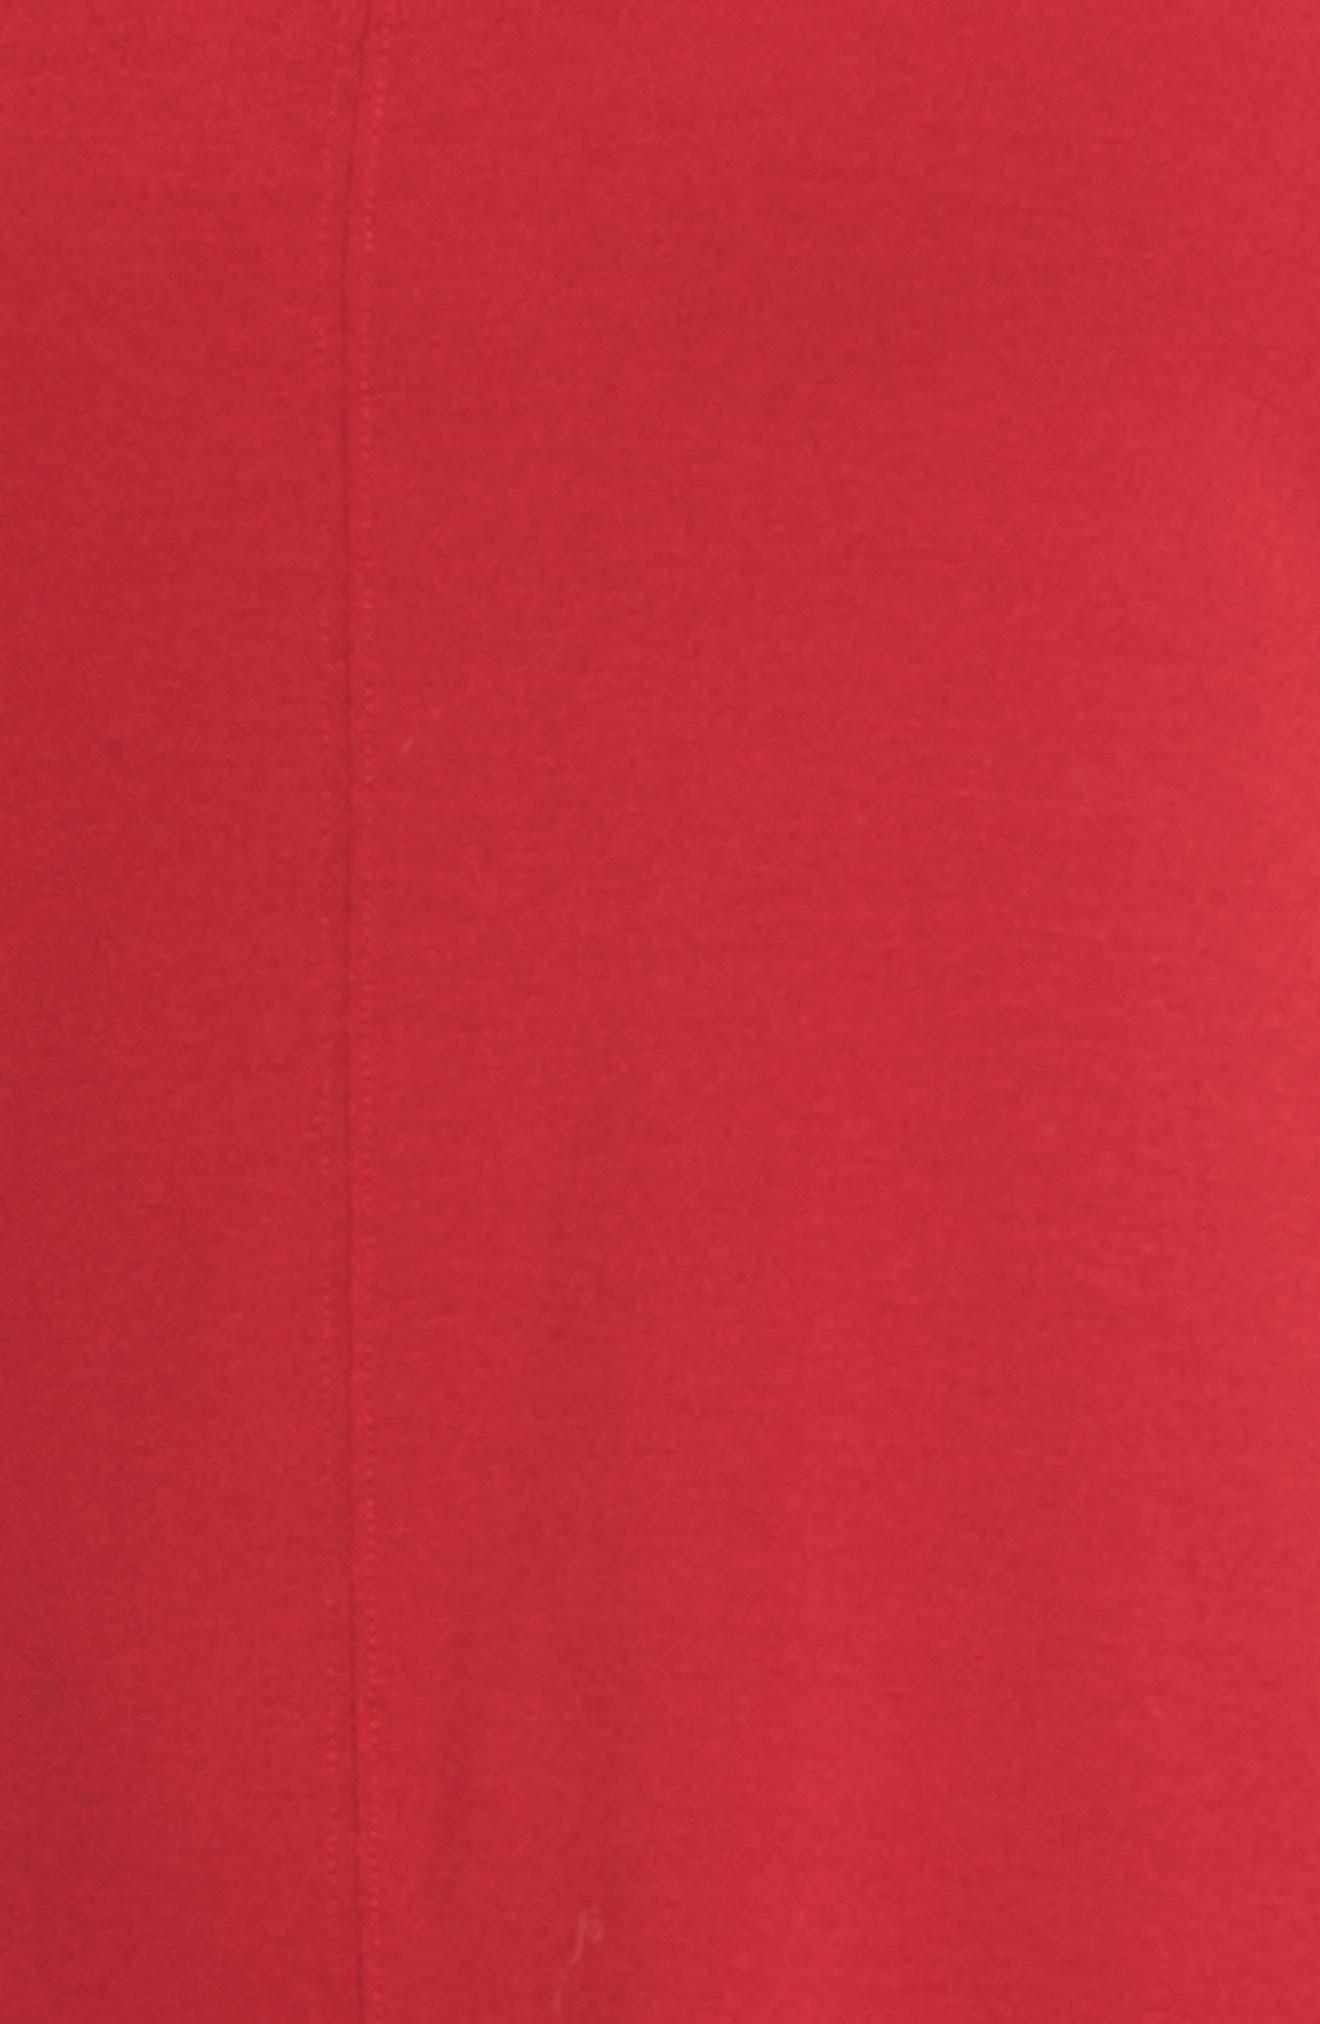 Jersey Bateau Neck Tunic,                             Alternate thumbnail 45, color,